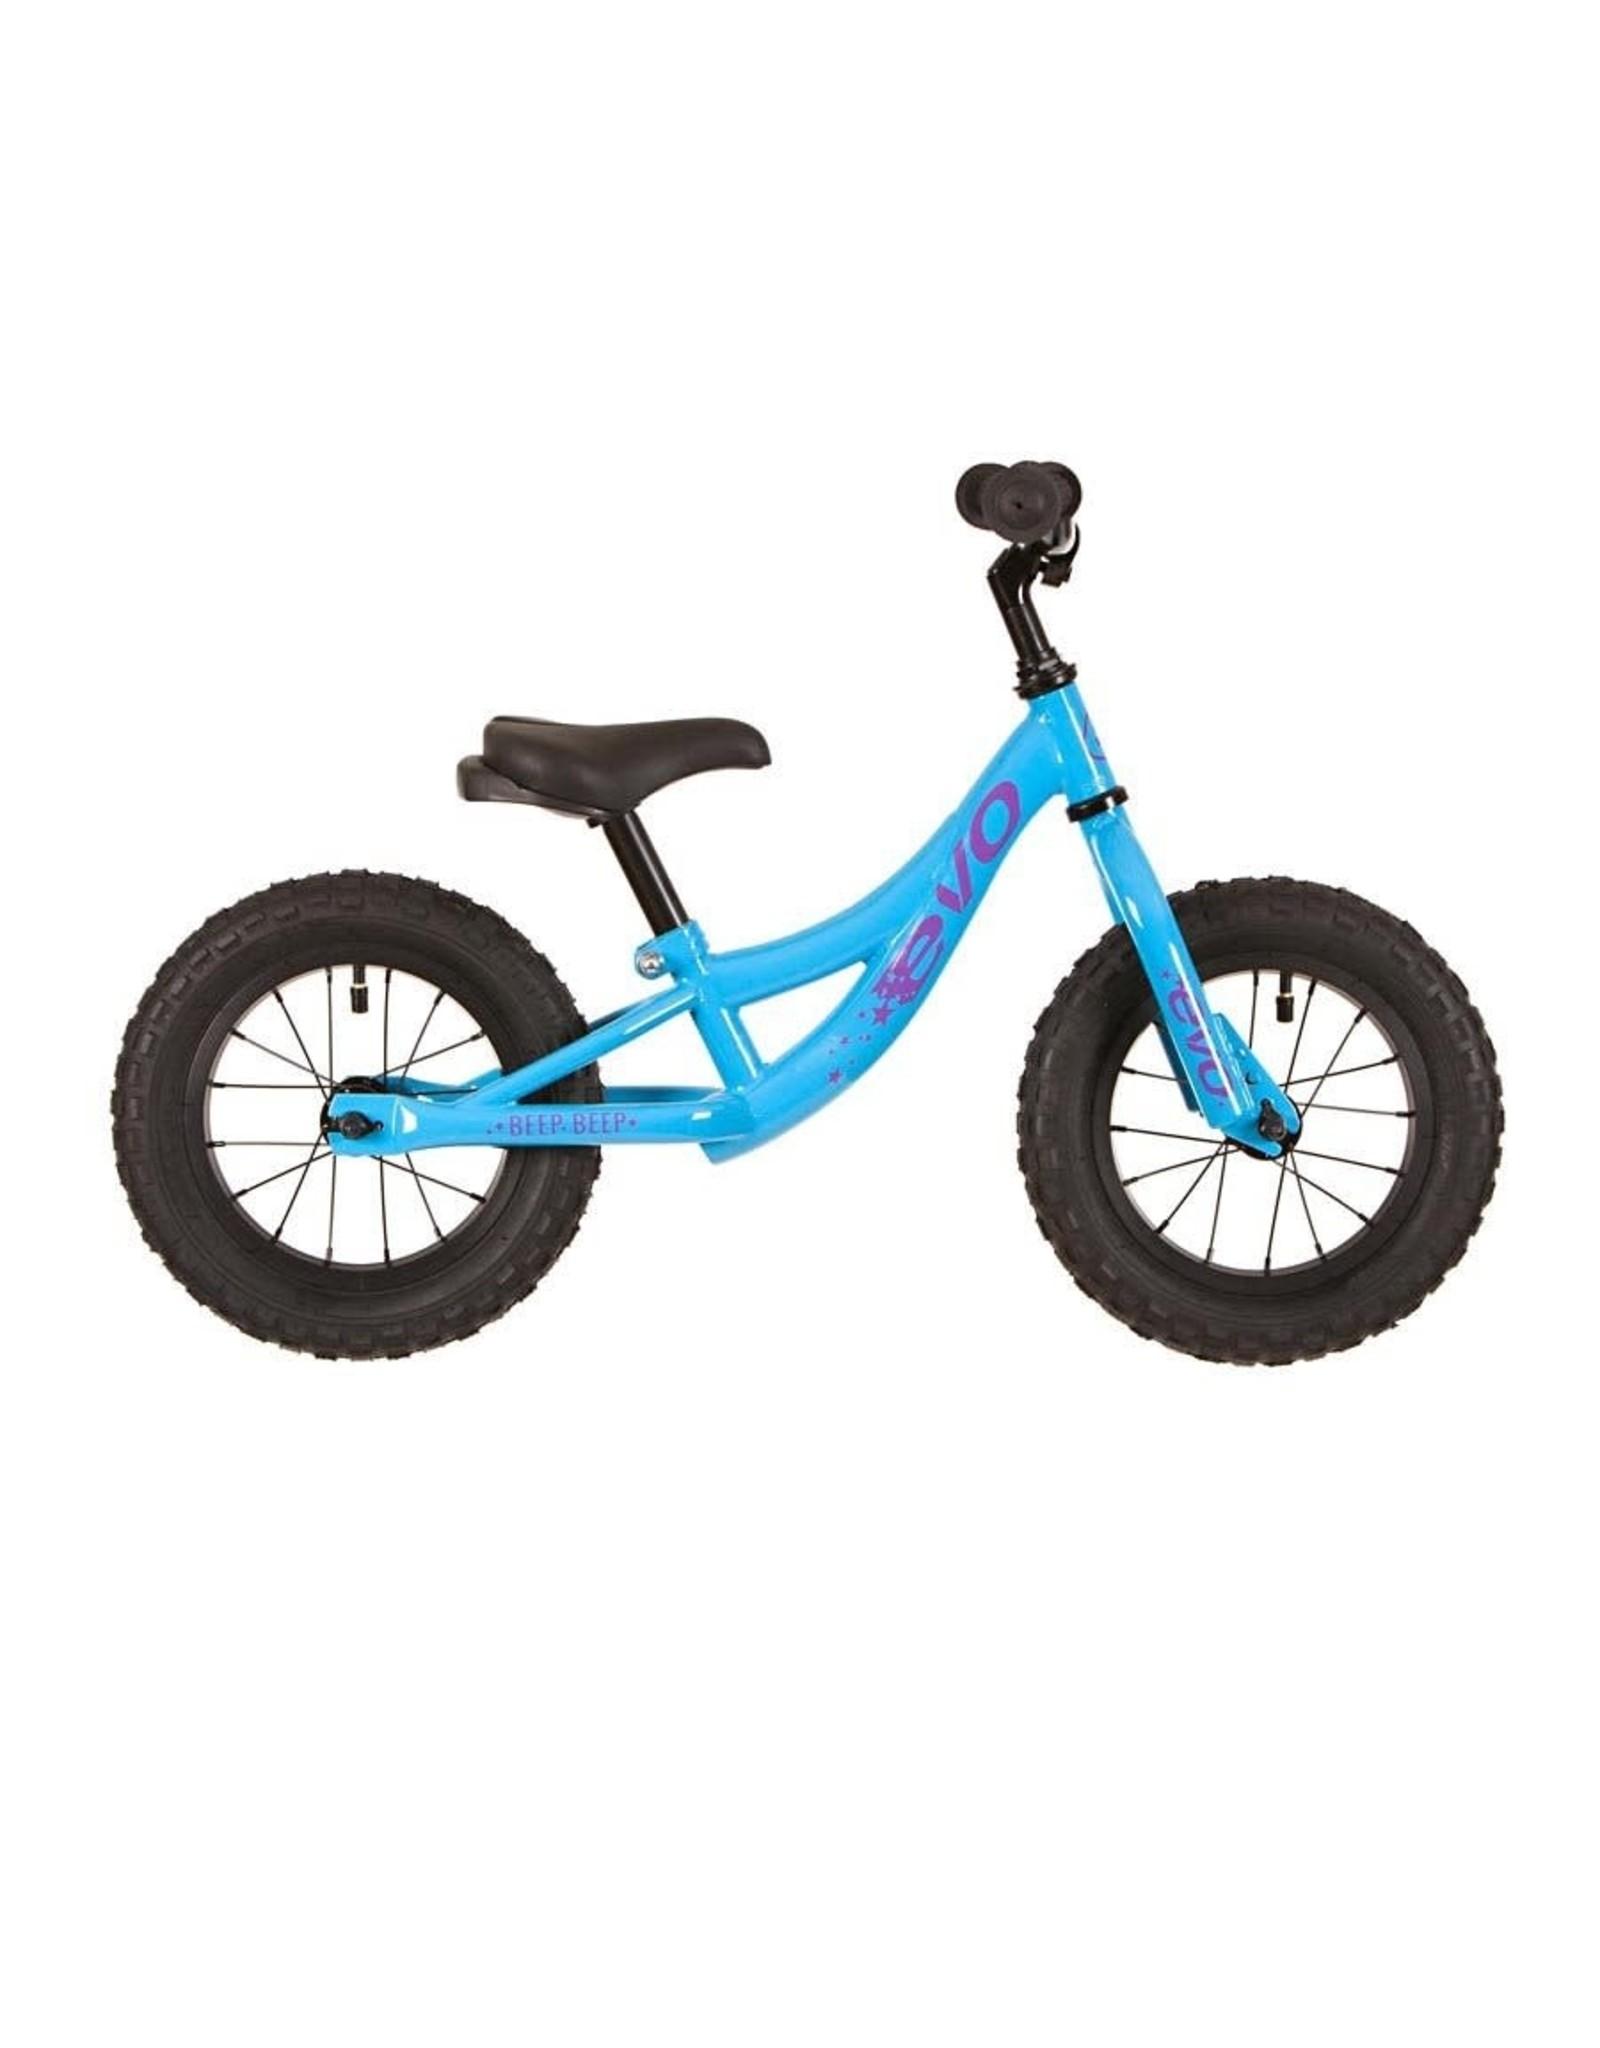 EVO EVO, Beep Beep Balance/Push Kids Bicycle, Mo Better Blue, Universal One-Size